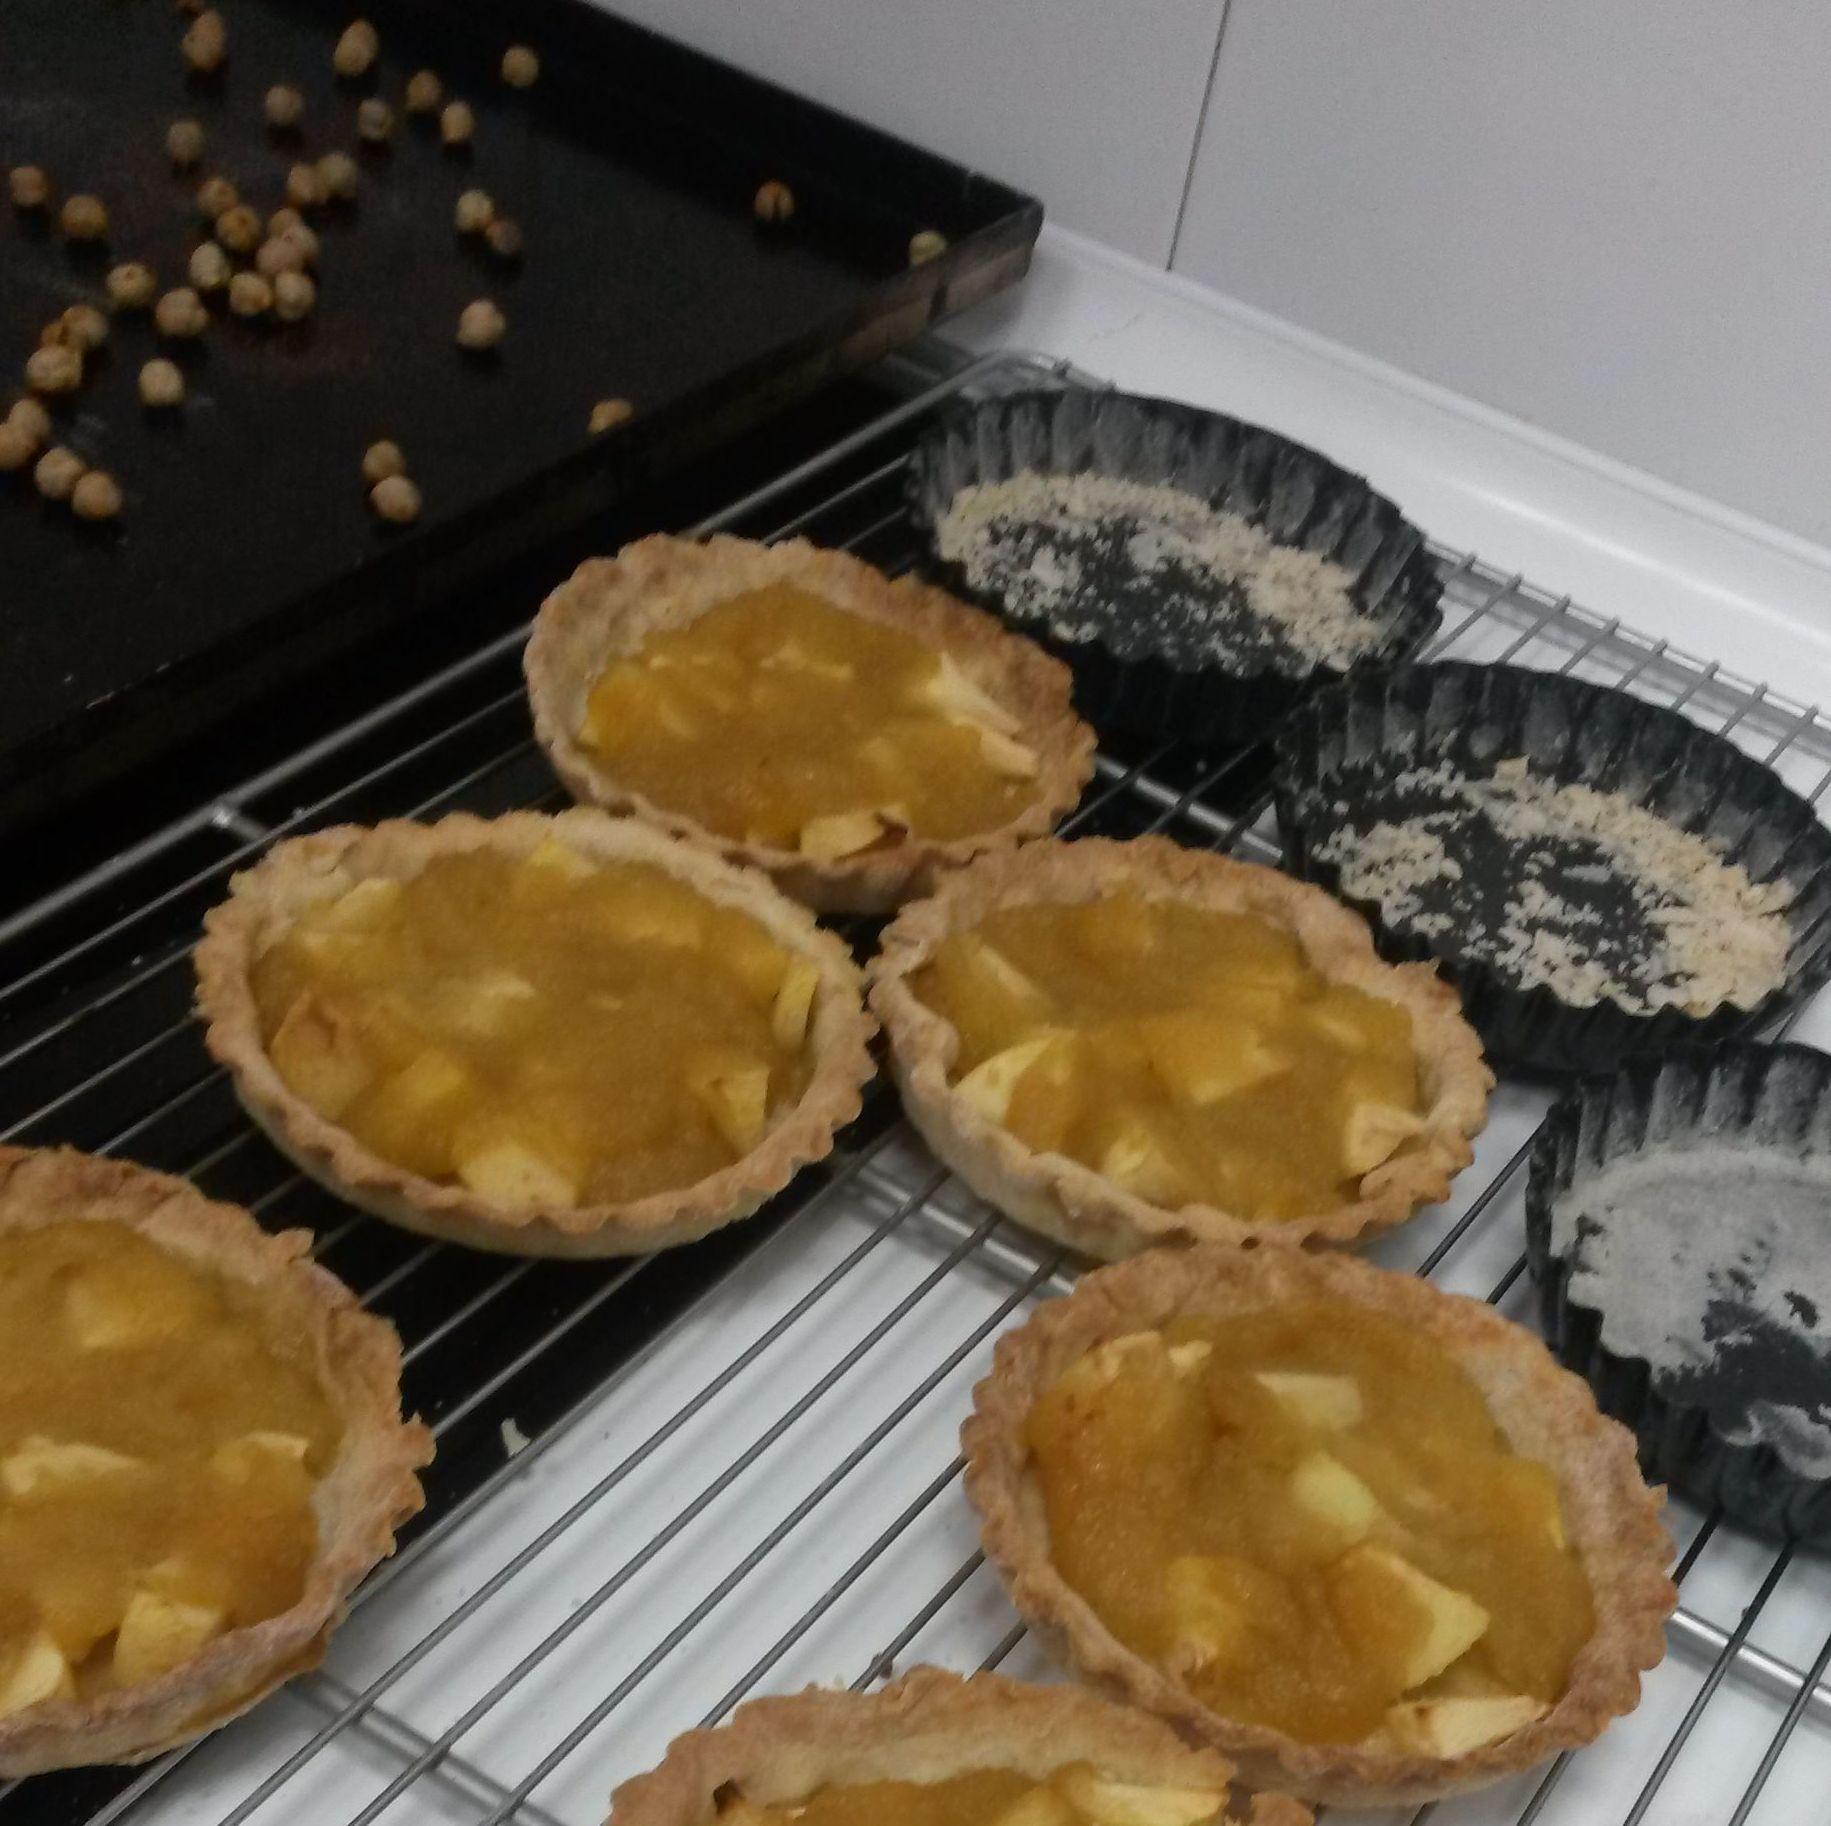 Ttartitas de pastaflora Manzana y compota